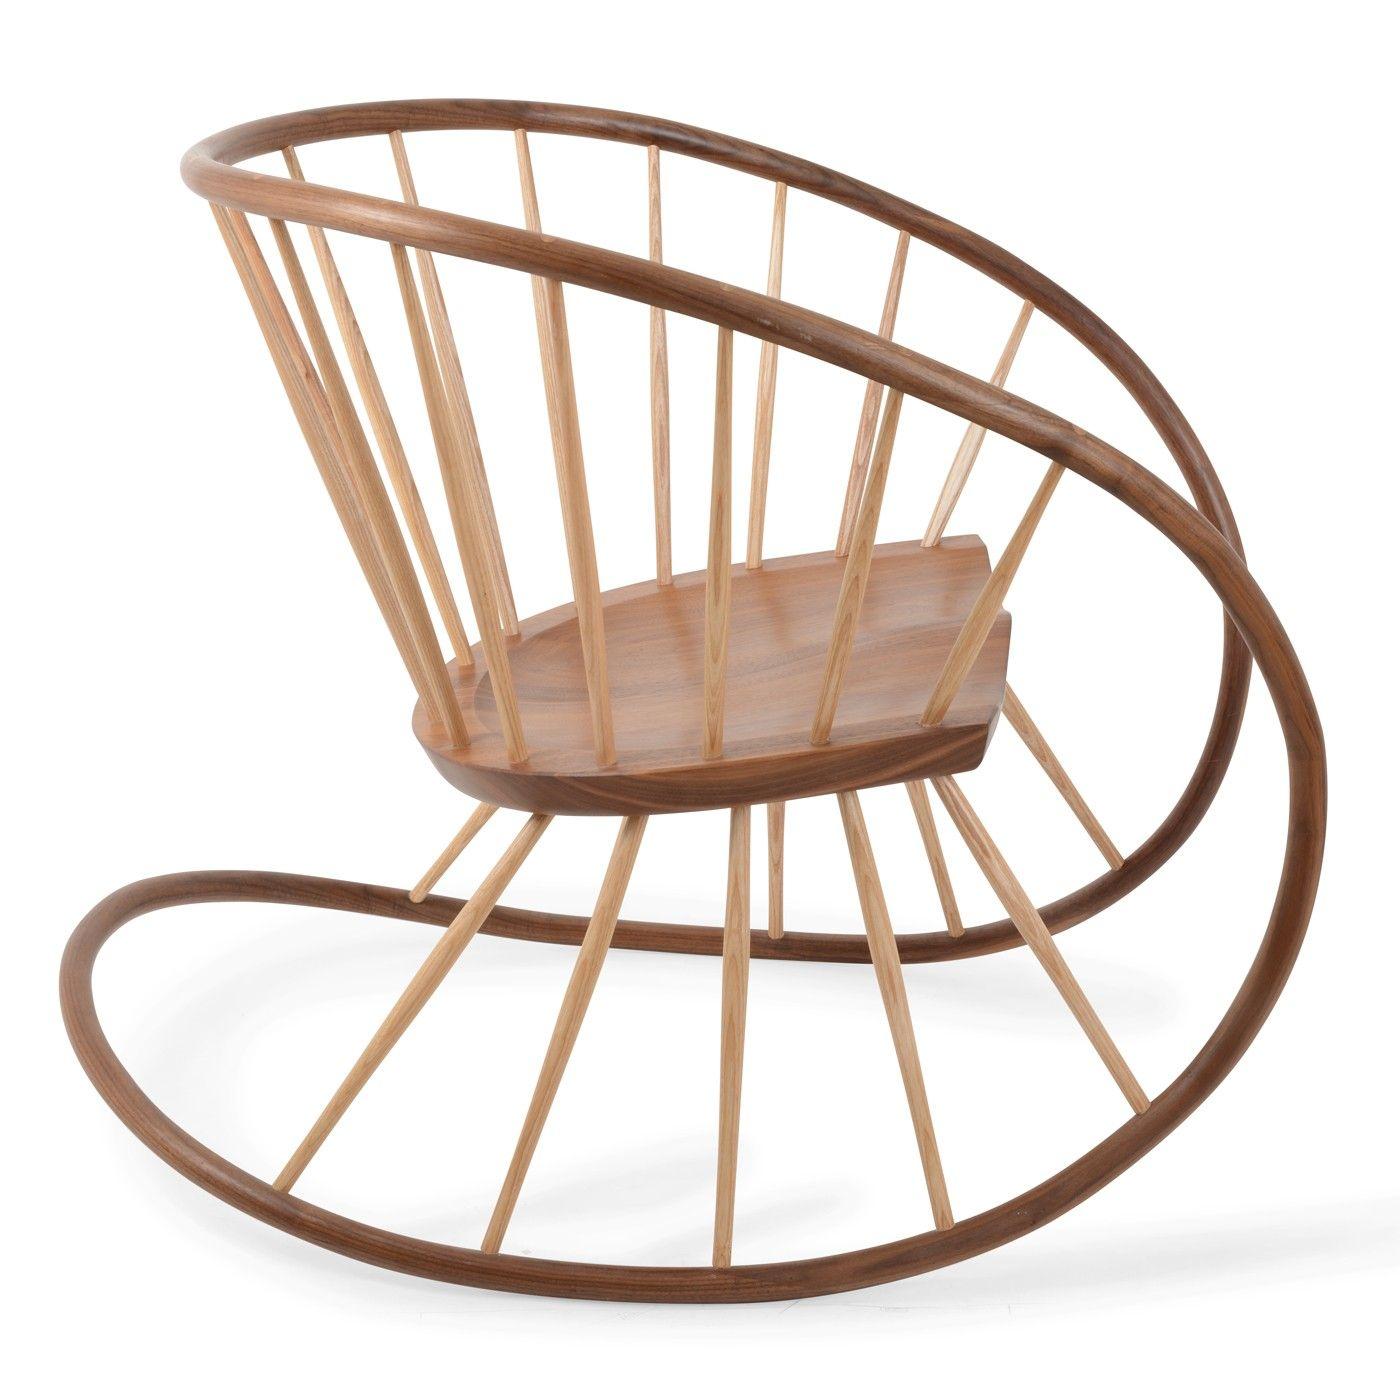 award winning furniture designer katie walker who also produced